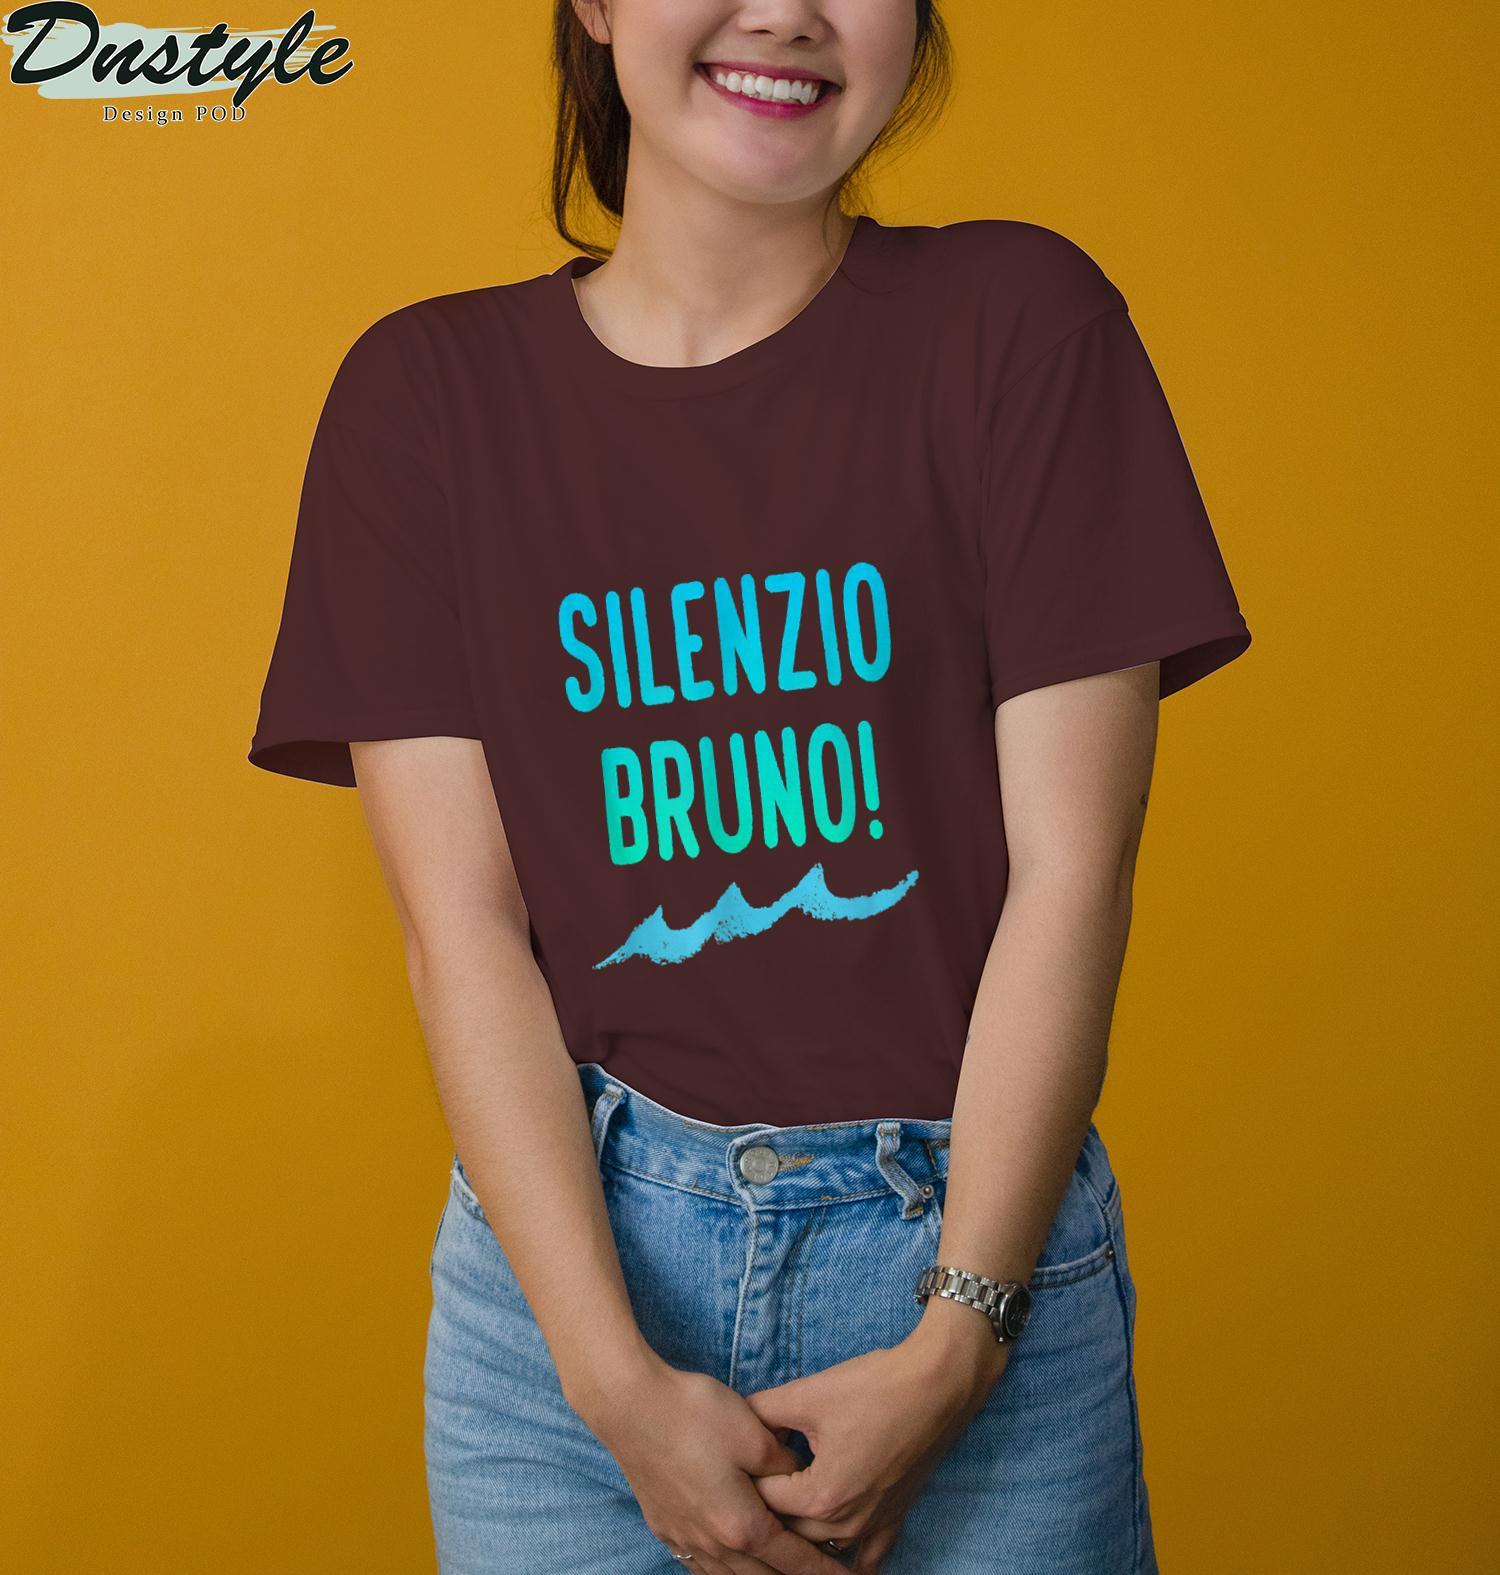 Luca Silenzio Bruno T-Shirt 3